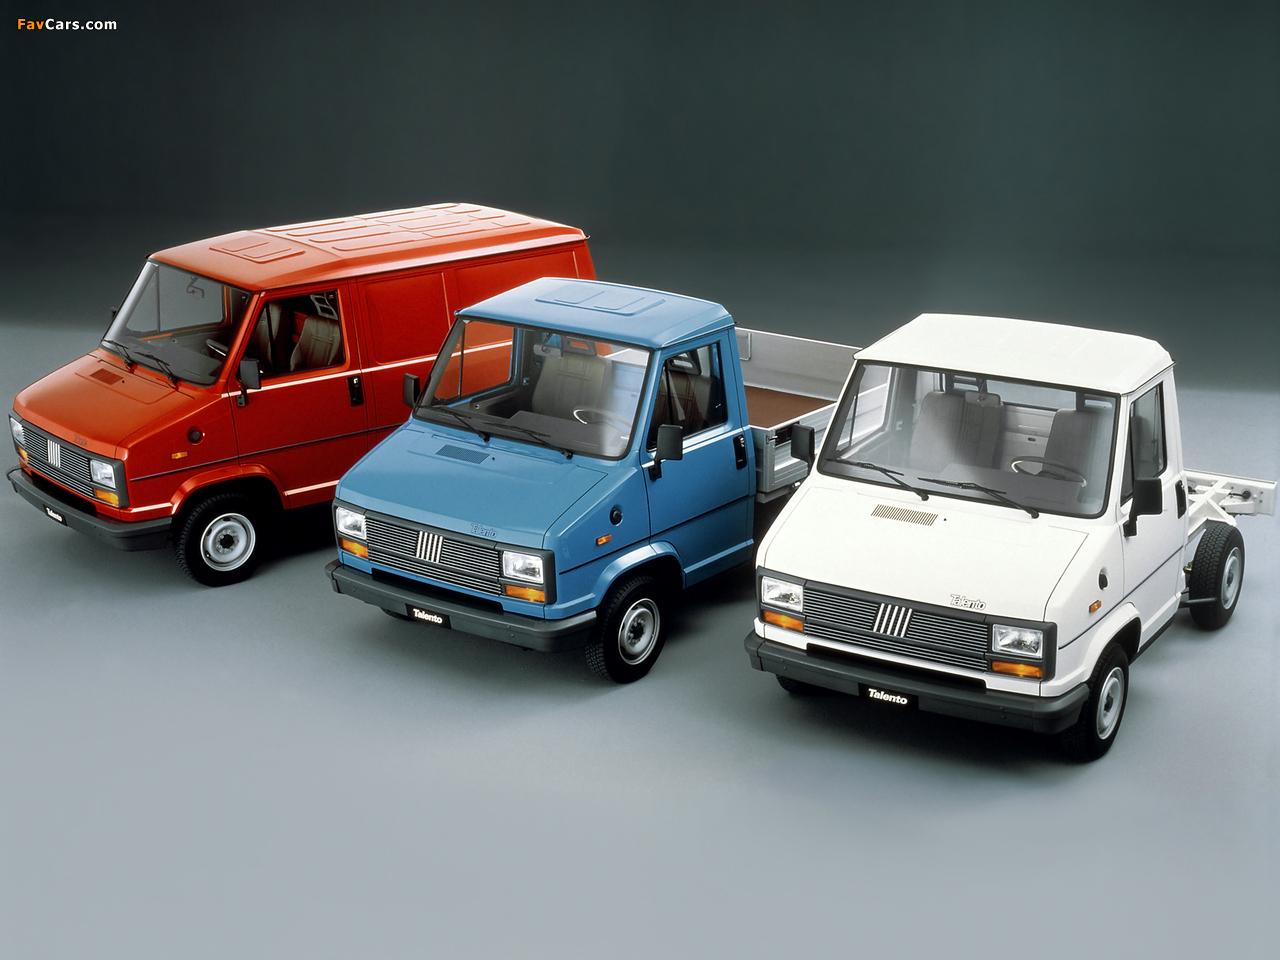 2014 [Renault/Opel/Fiat/Nissan] Trafic/Vivaro/Talento/NV300 - Page 12 Fiat_talento__photos_1_1280x960